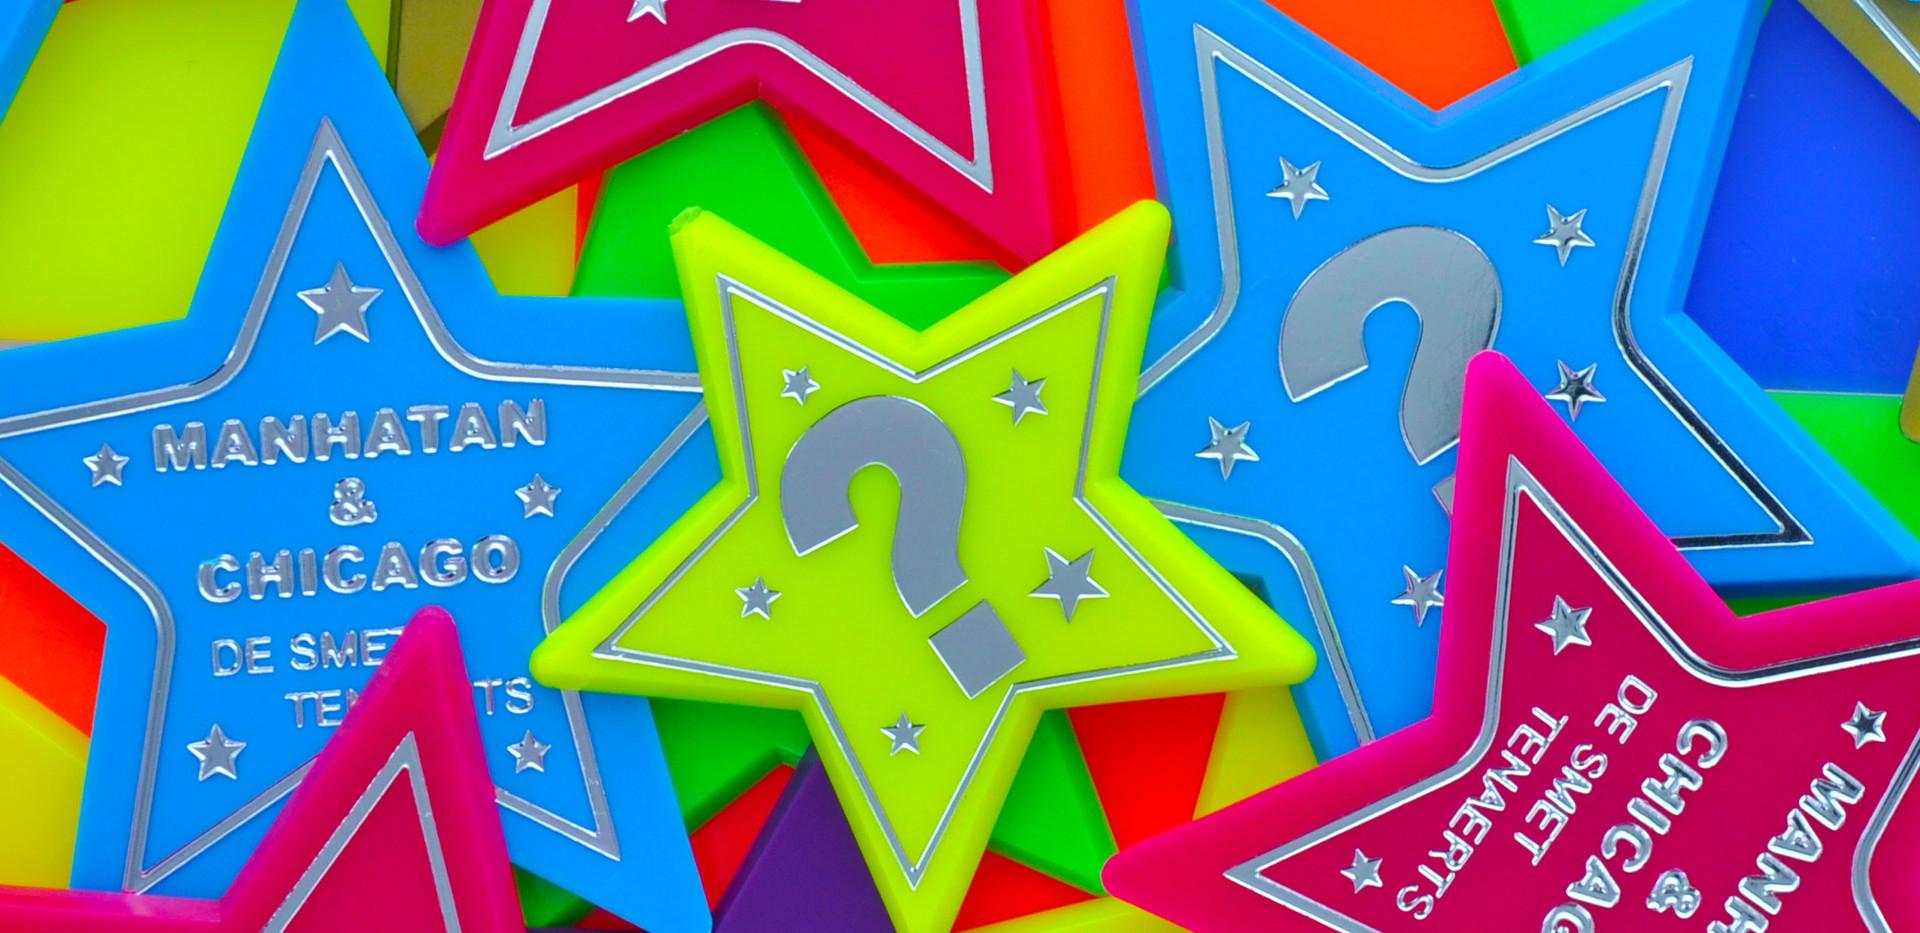 Star-shaped fairground tokens